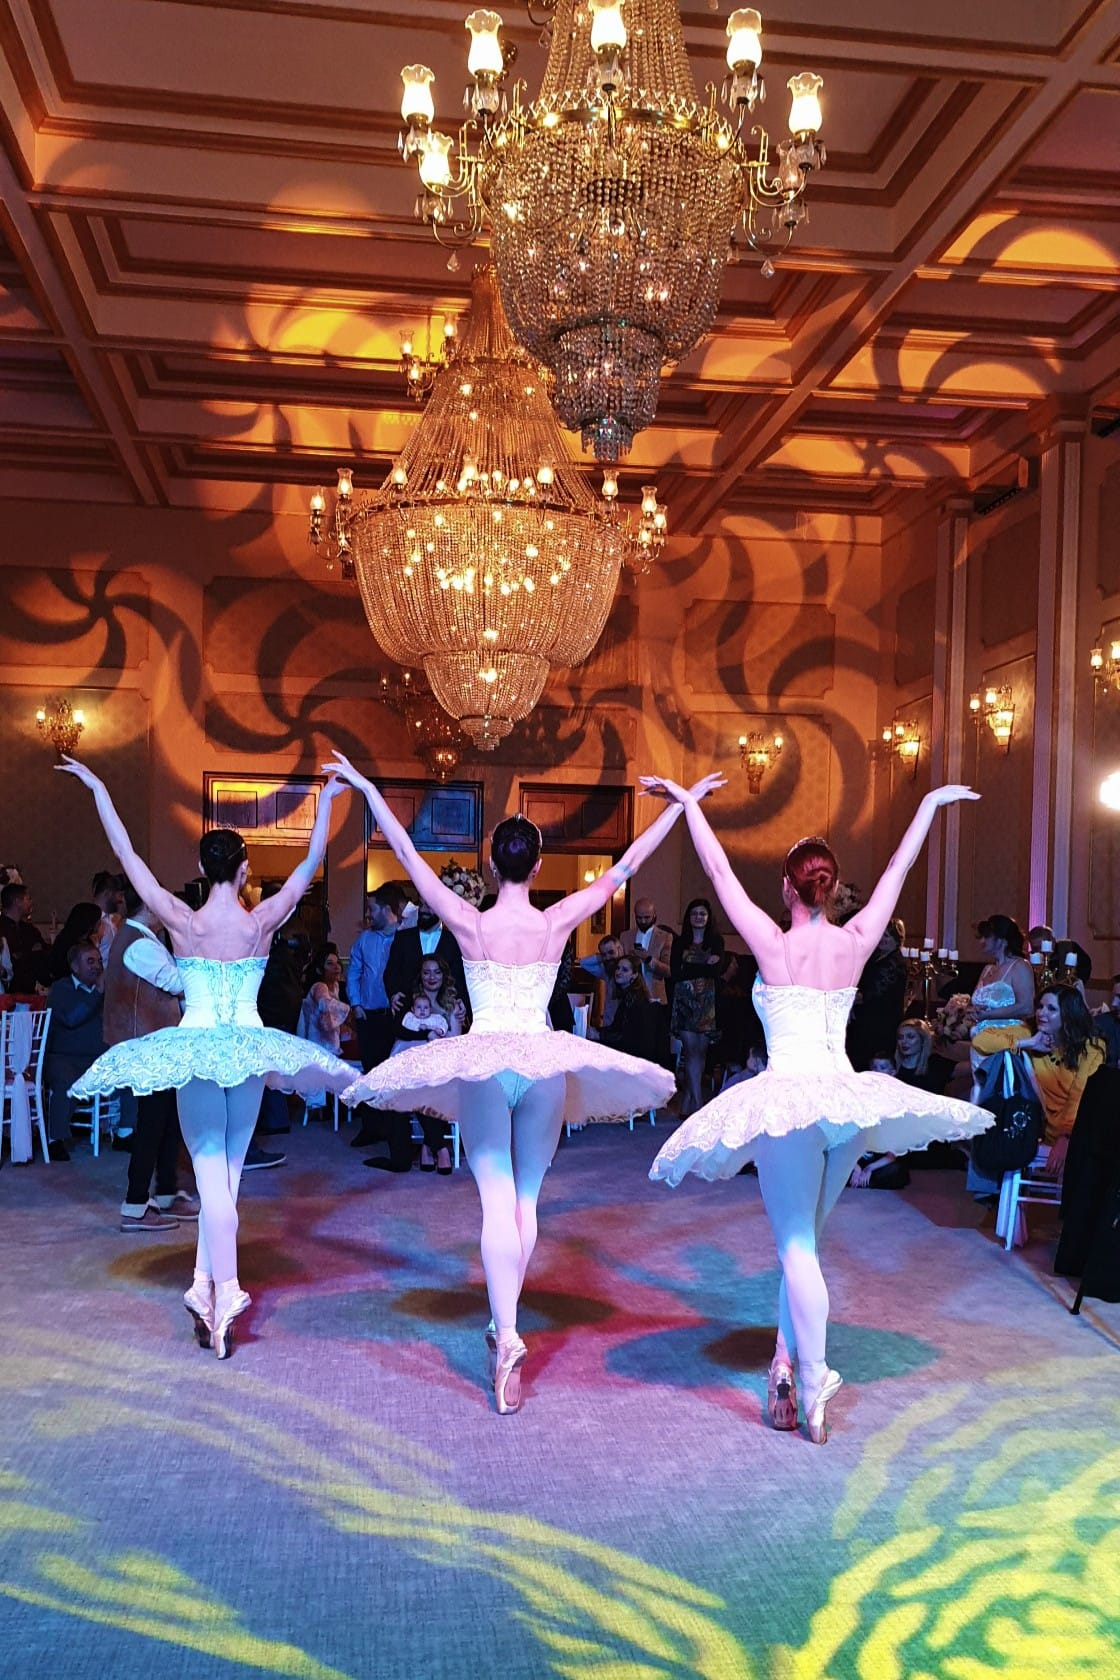 Ursitoare Botez | Baletul WOW Dance - Ursitoare Balerine - http://wowdance.ro/ursitoare/